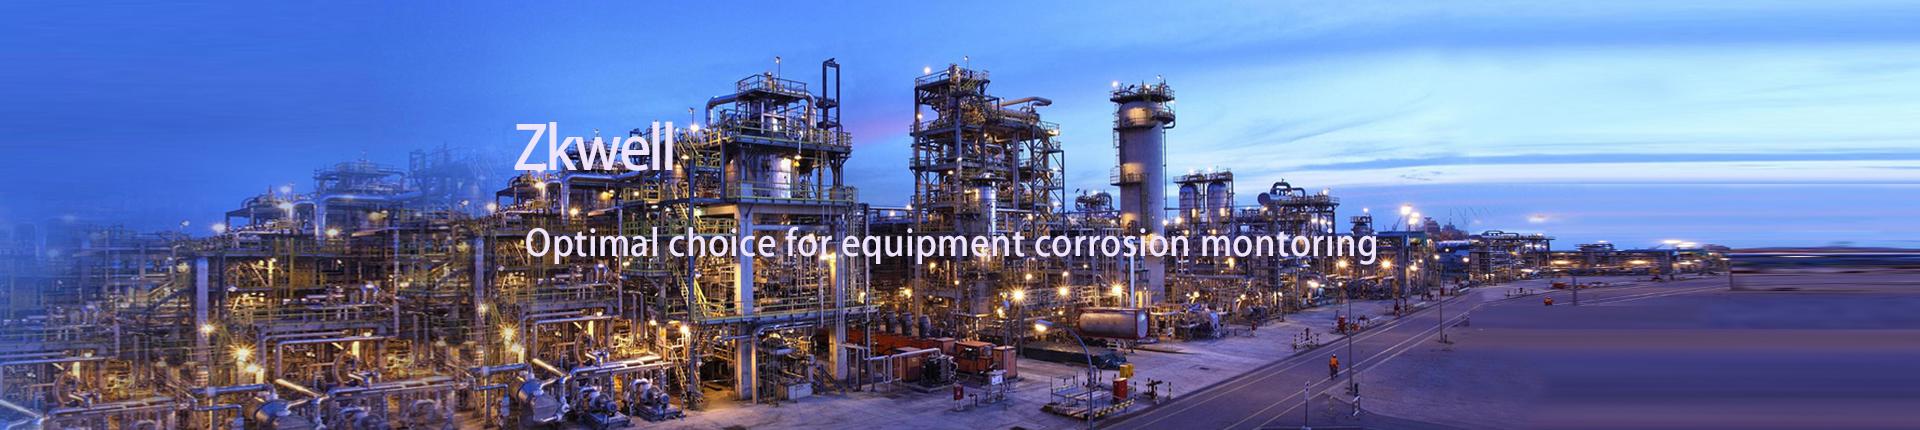 Corrosion monitoring system